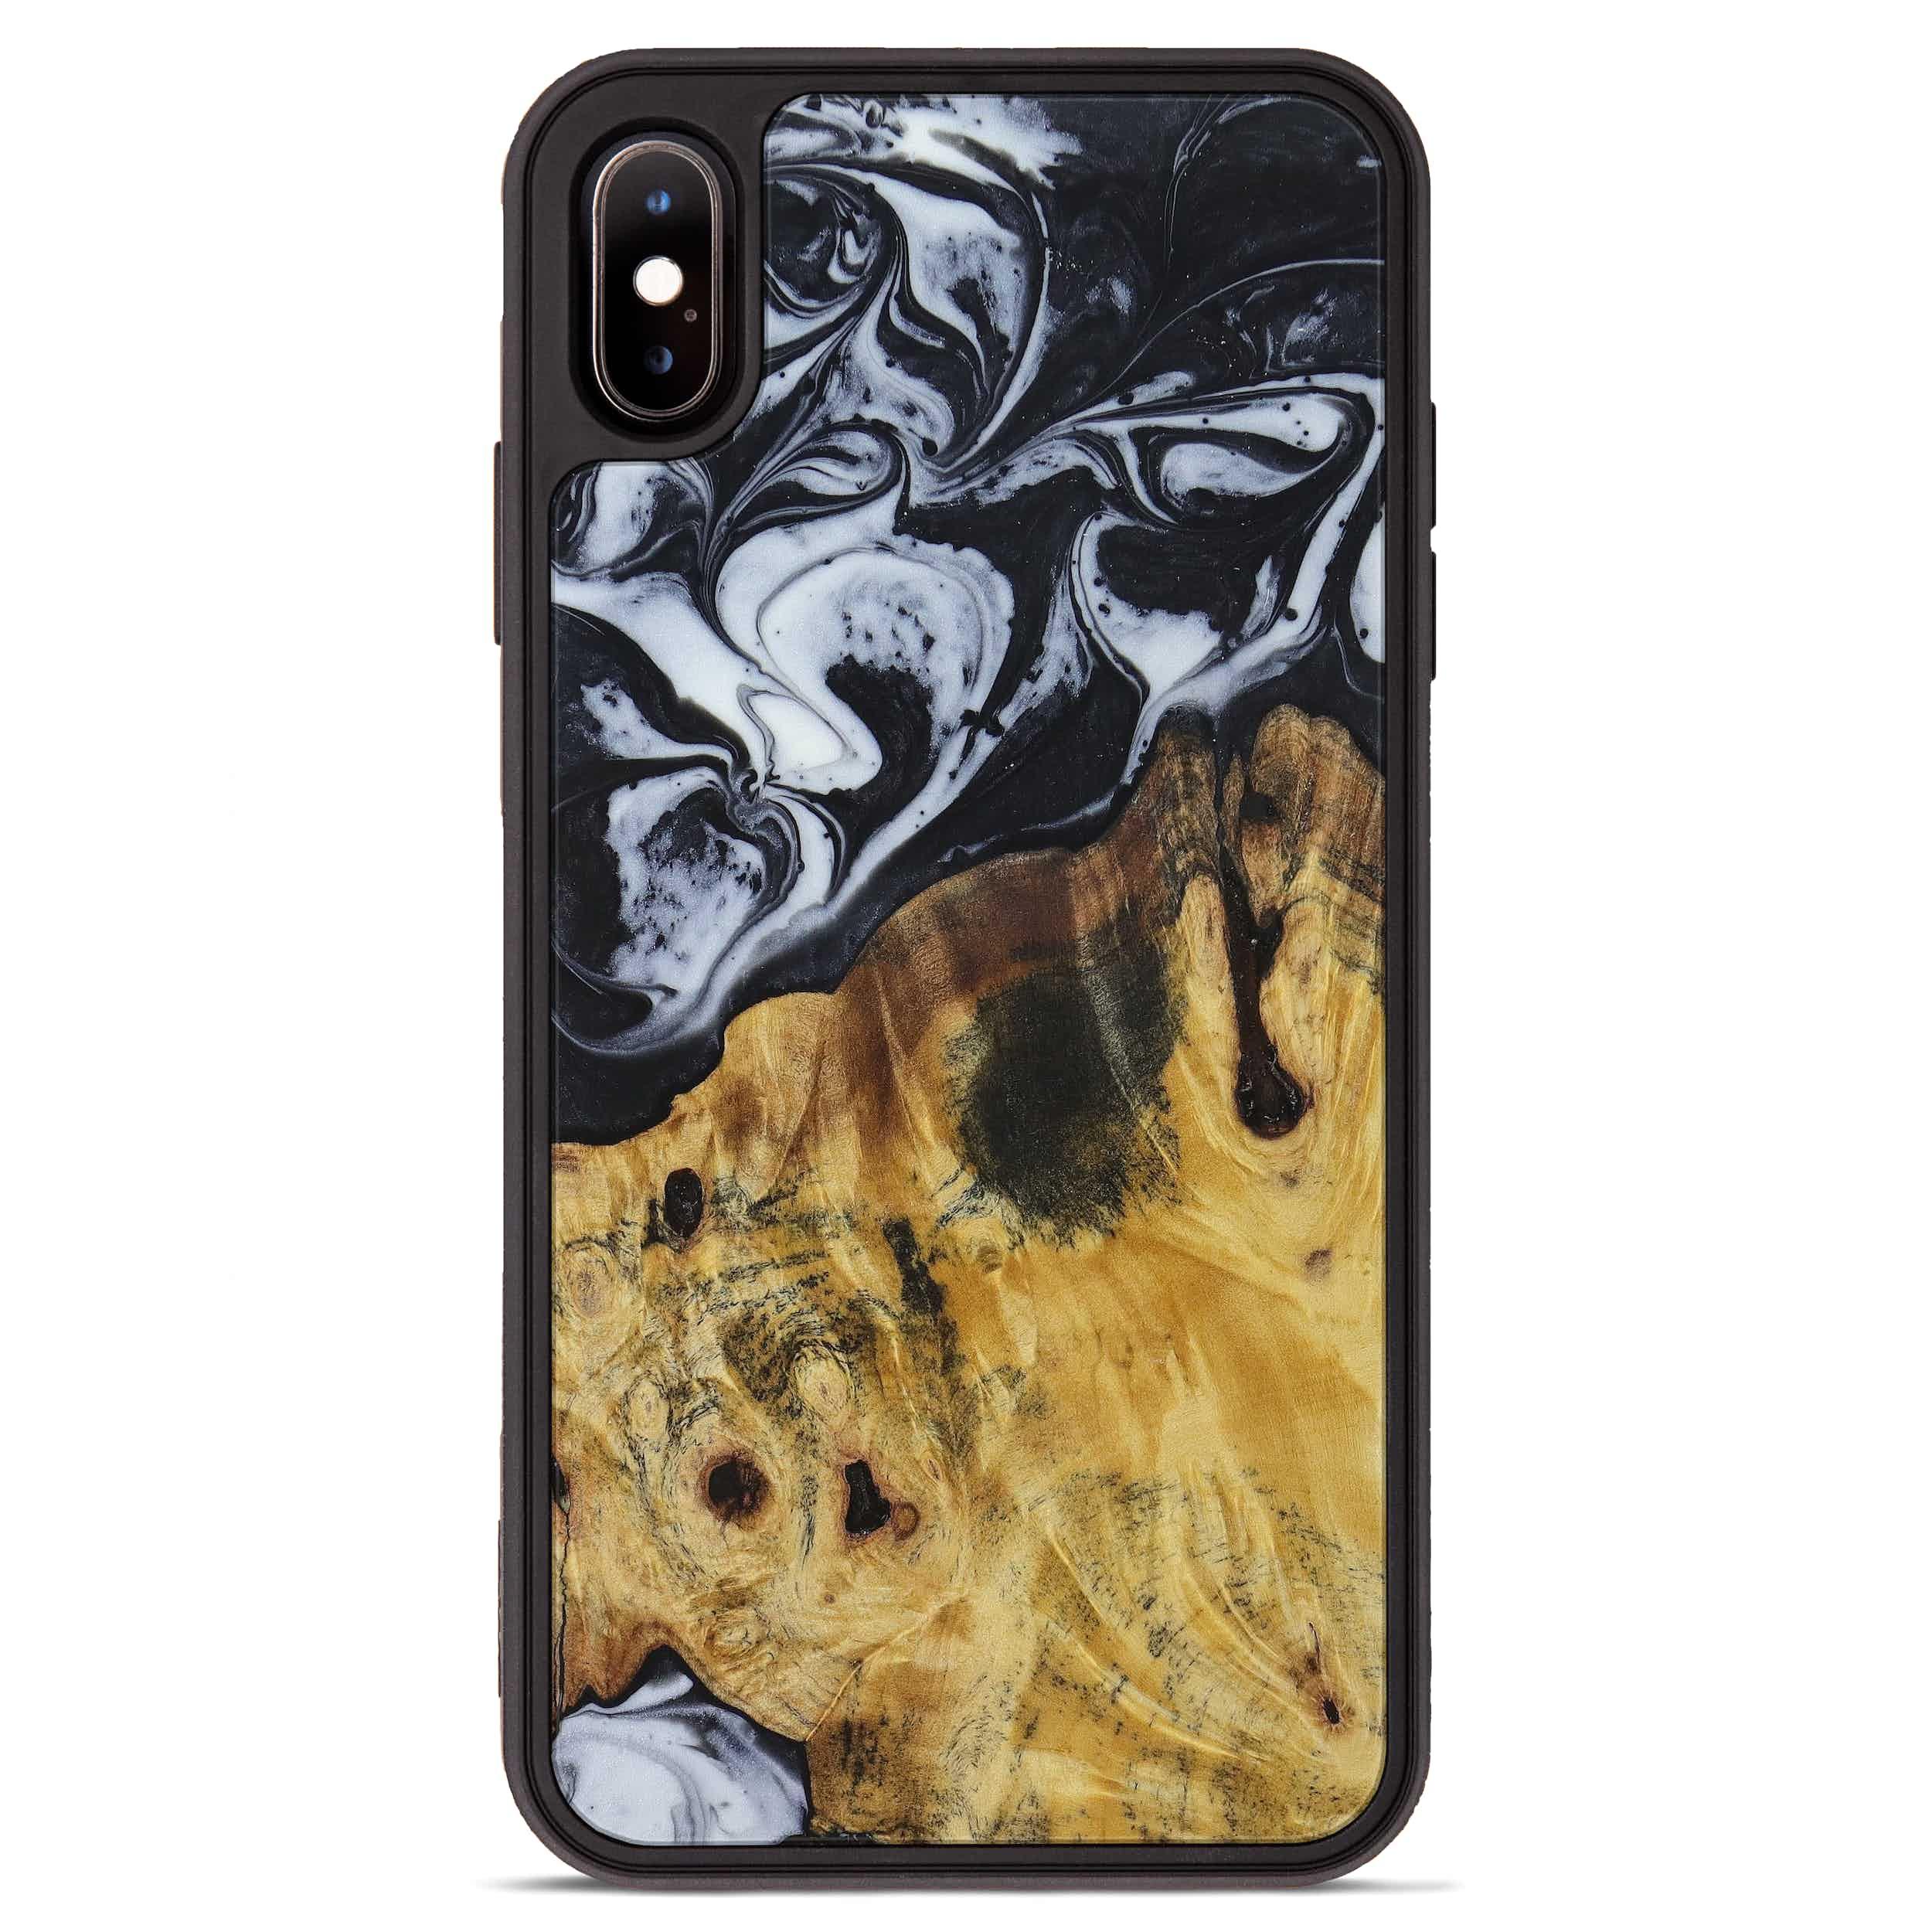 iPhone Xs Max Wood+Resin Phone Case - Dinah (Black & White, 397374)